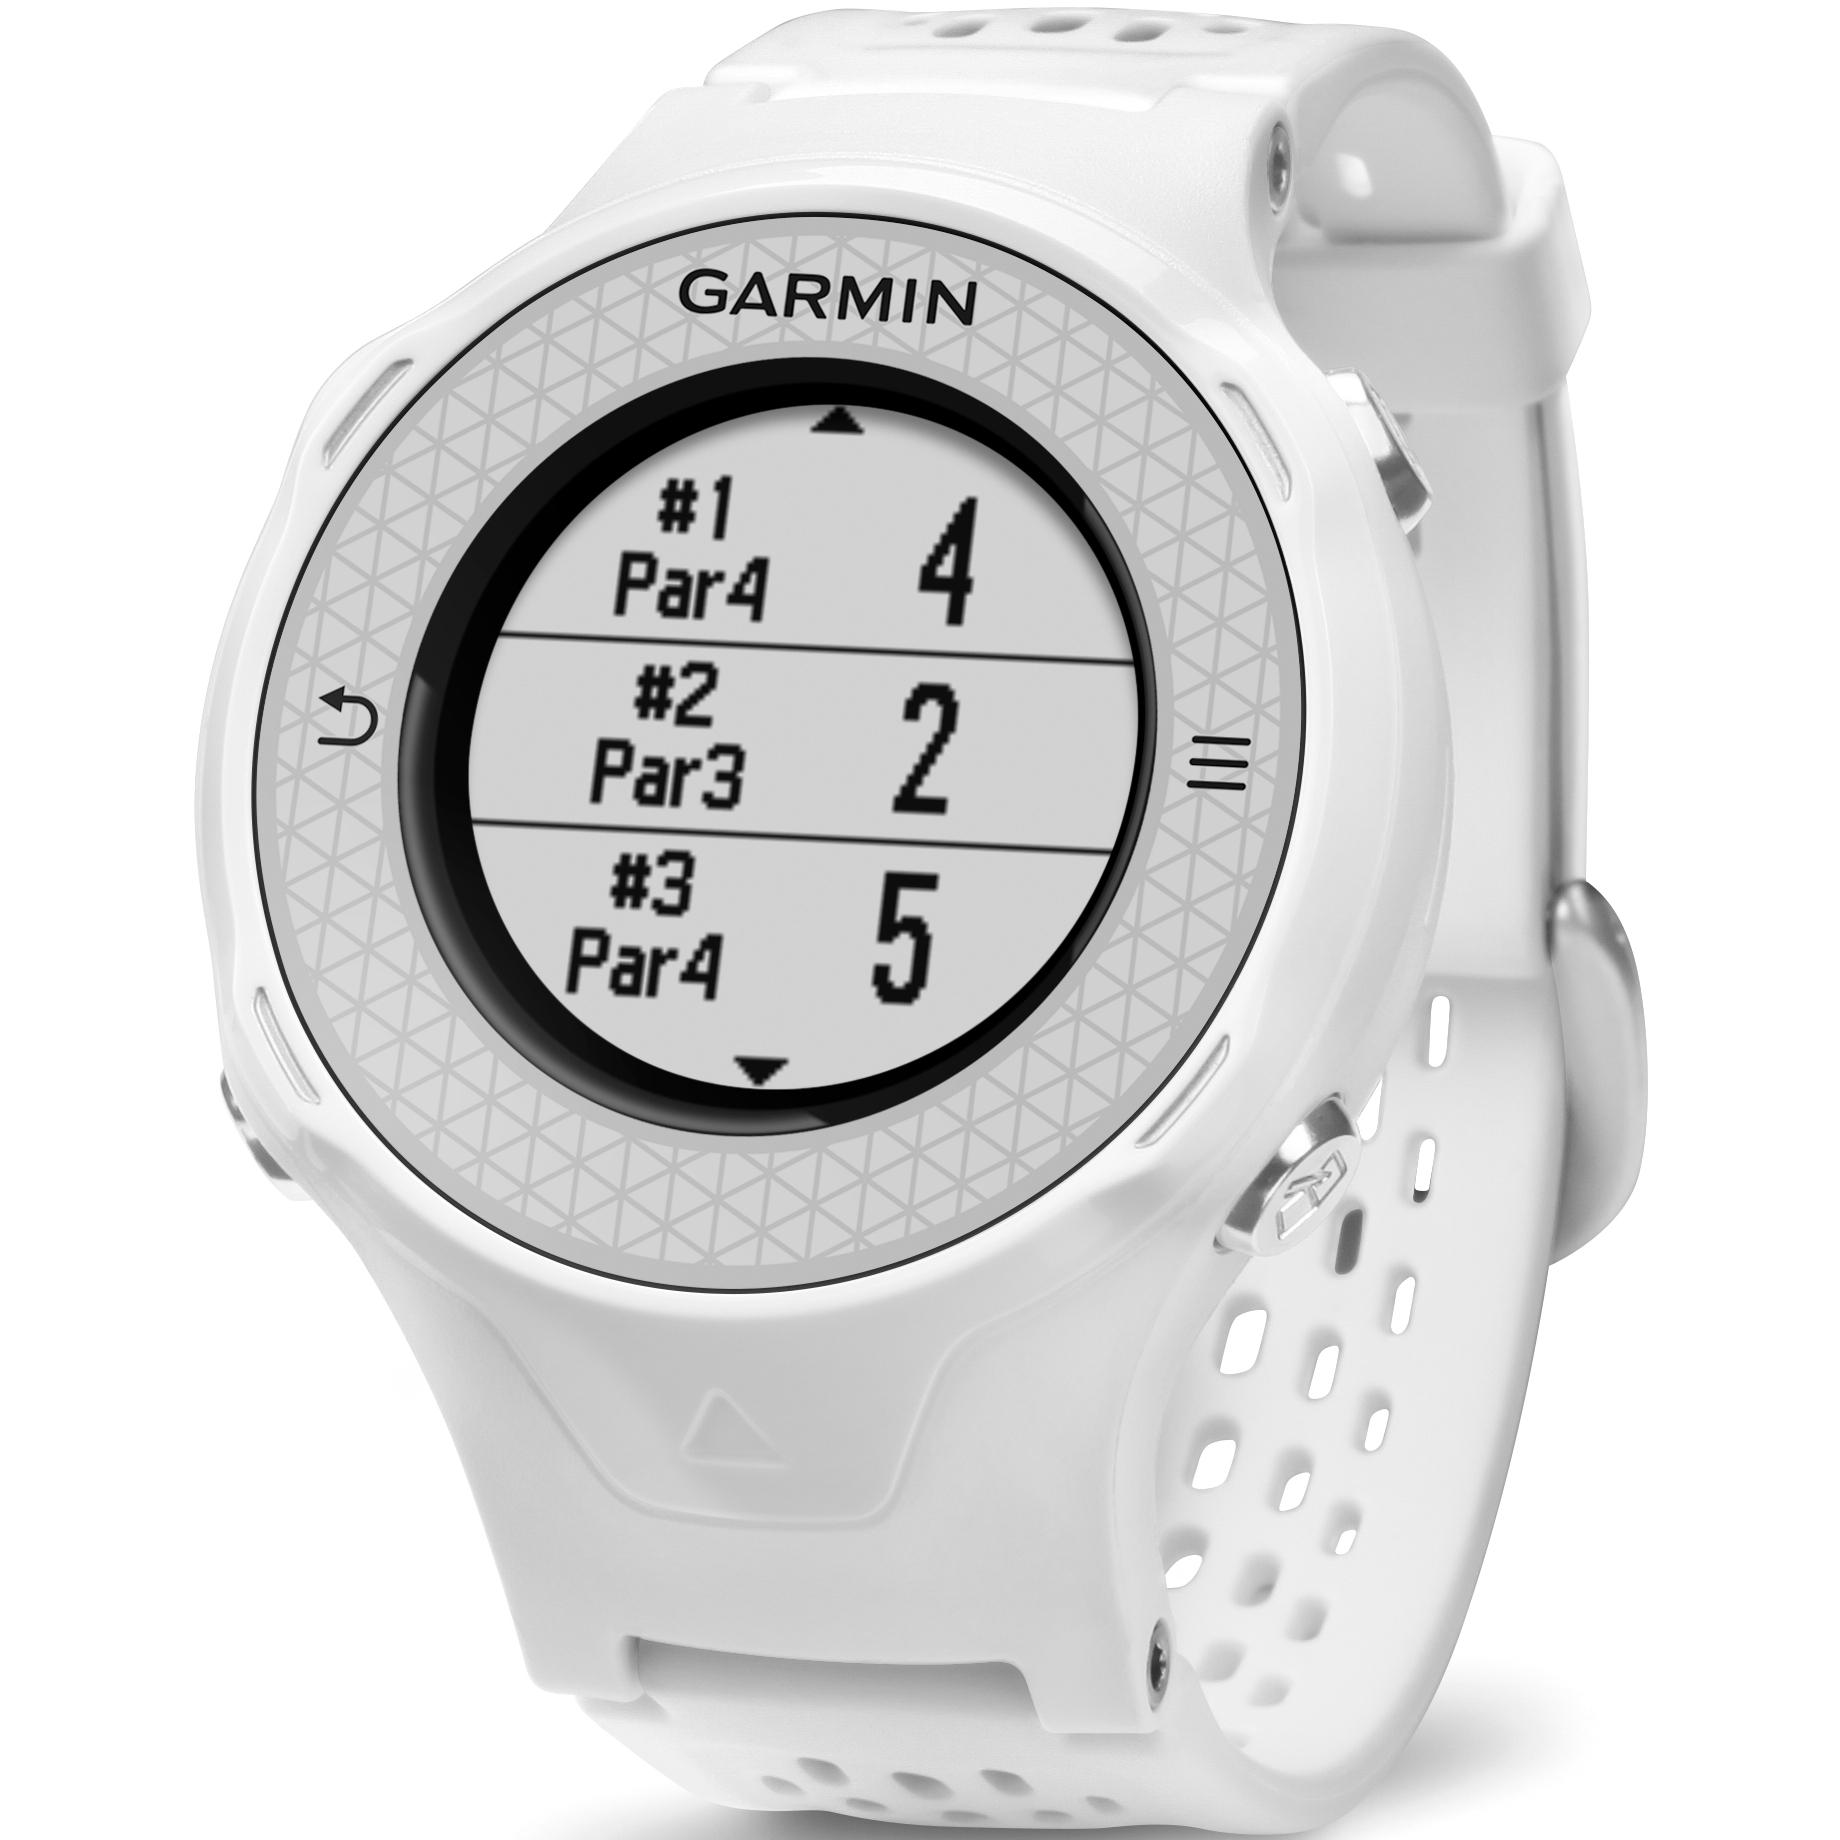 garmin approach s4 gps golf uhr touchscreen anzeige der. Black Bedroom Furniture Sets. Home Design Ideas